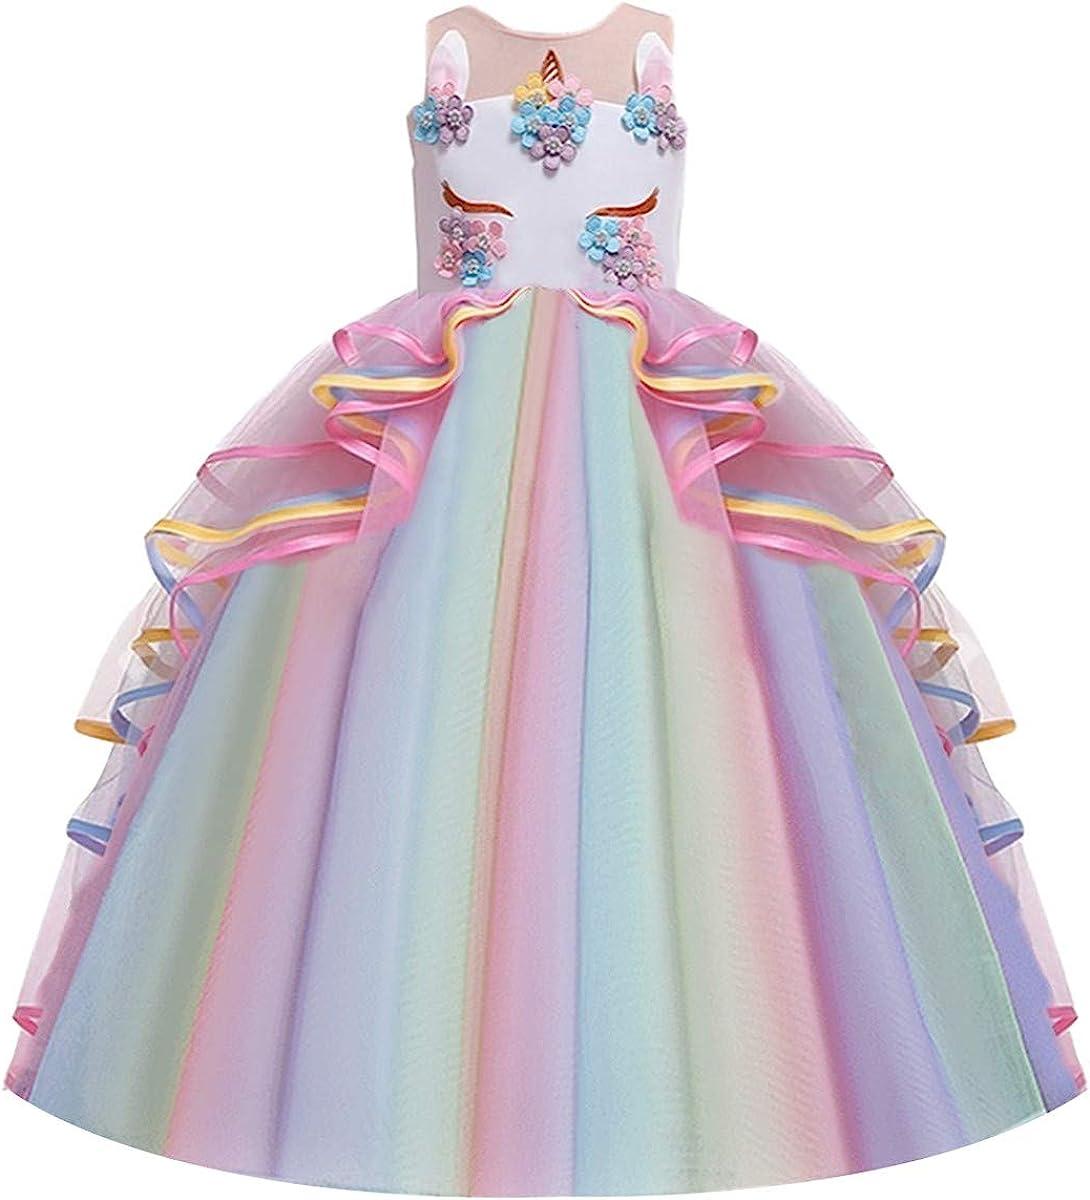 IZKIZF Girls Unicorn Rainbow Princess Party Carnival Minneapolis ! Super beauty product restock quality top! Mall Birthday Co